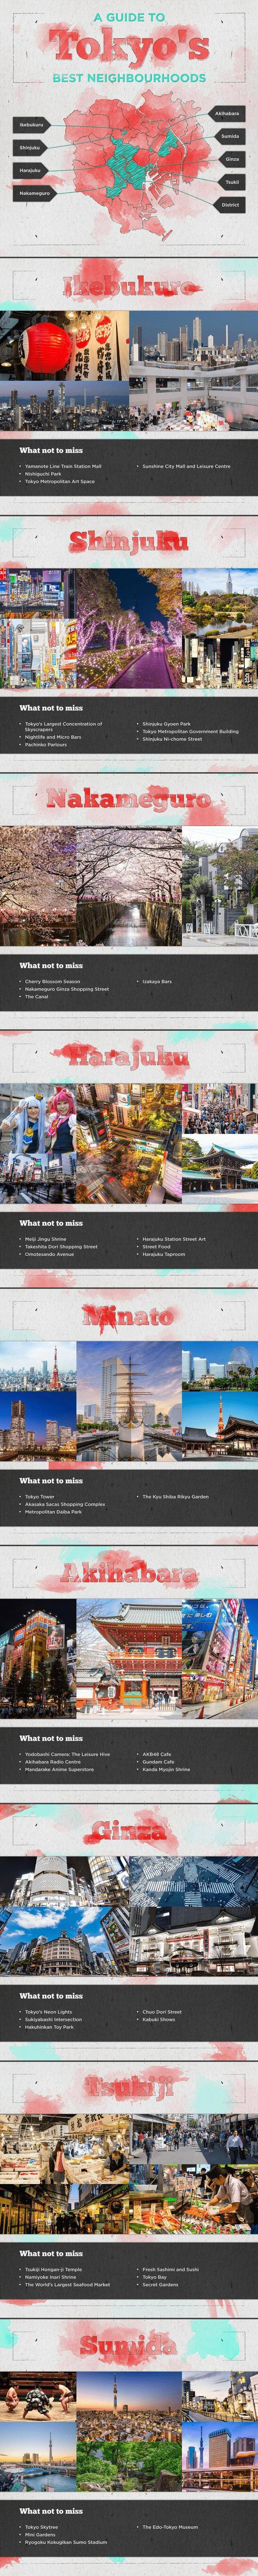 Tokyo's Neighborhood - A Tourist Guide - Infographic